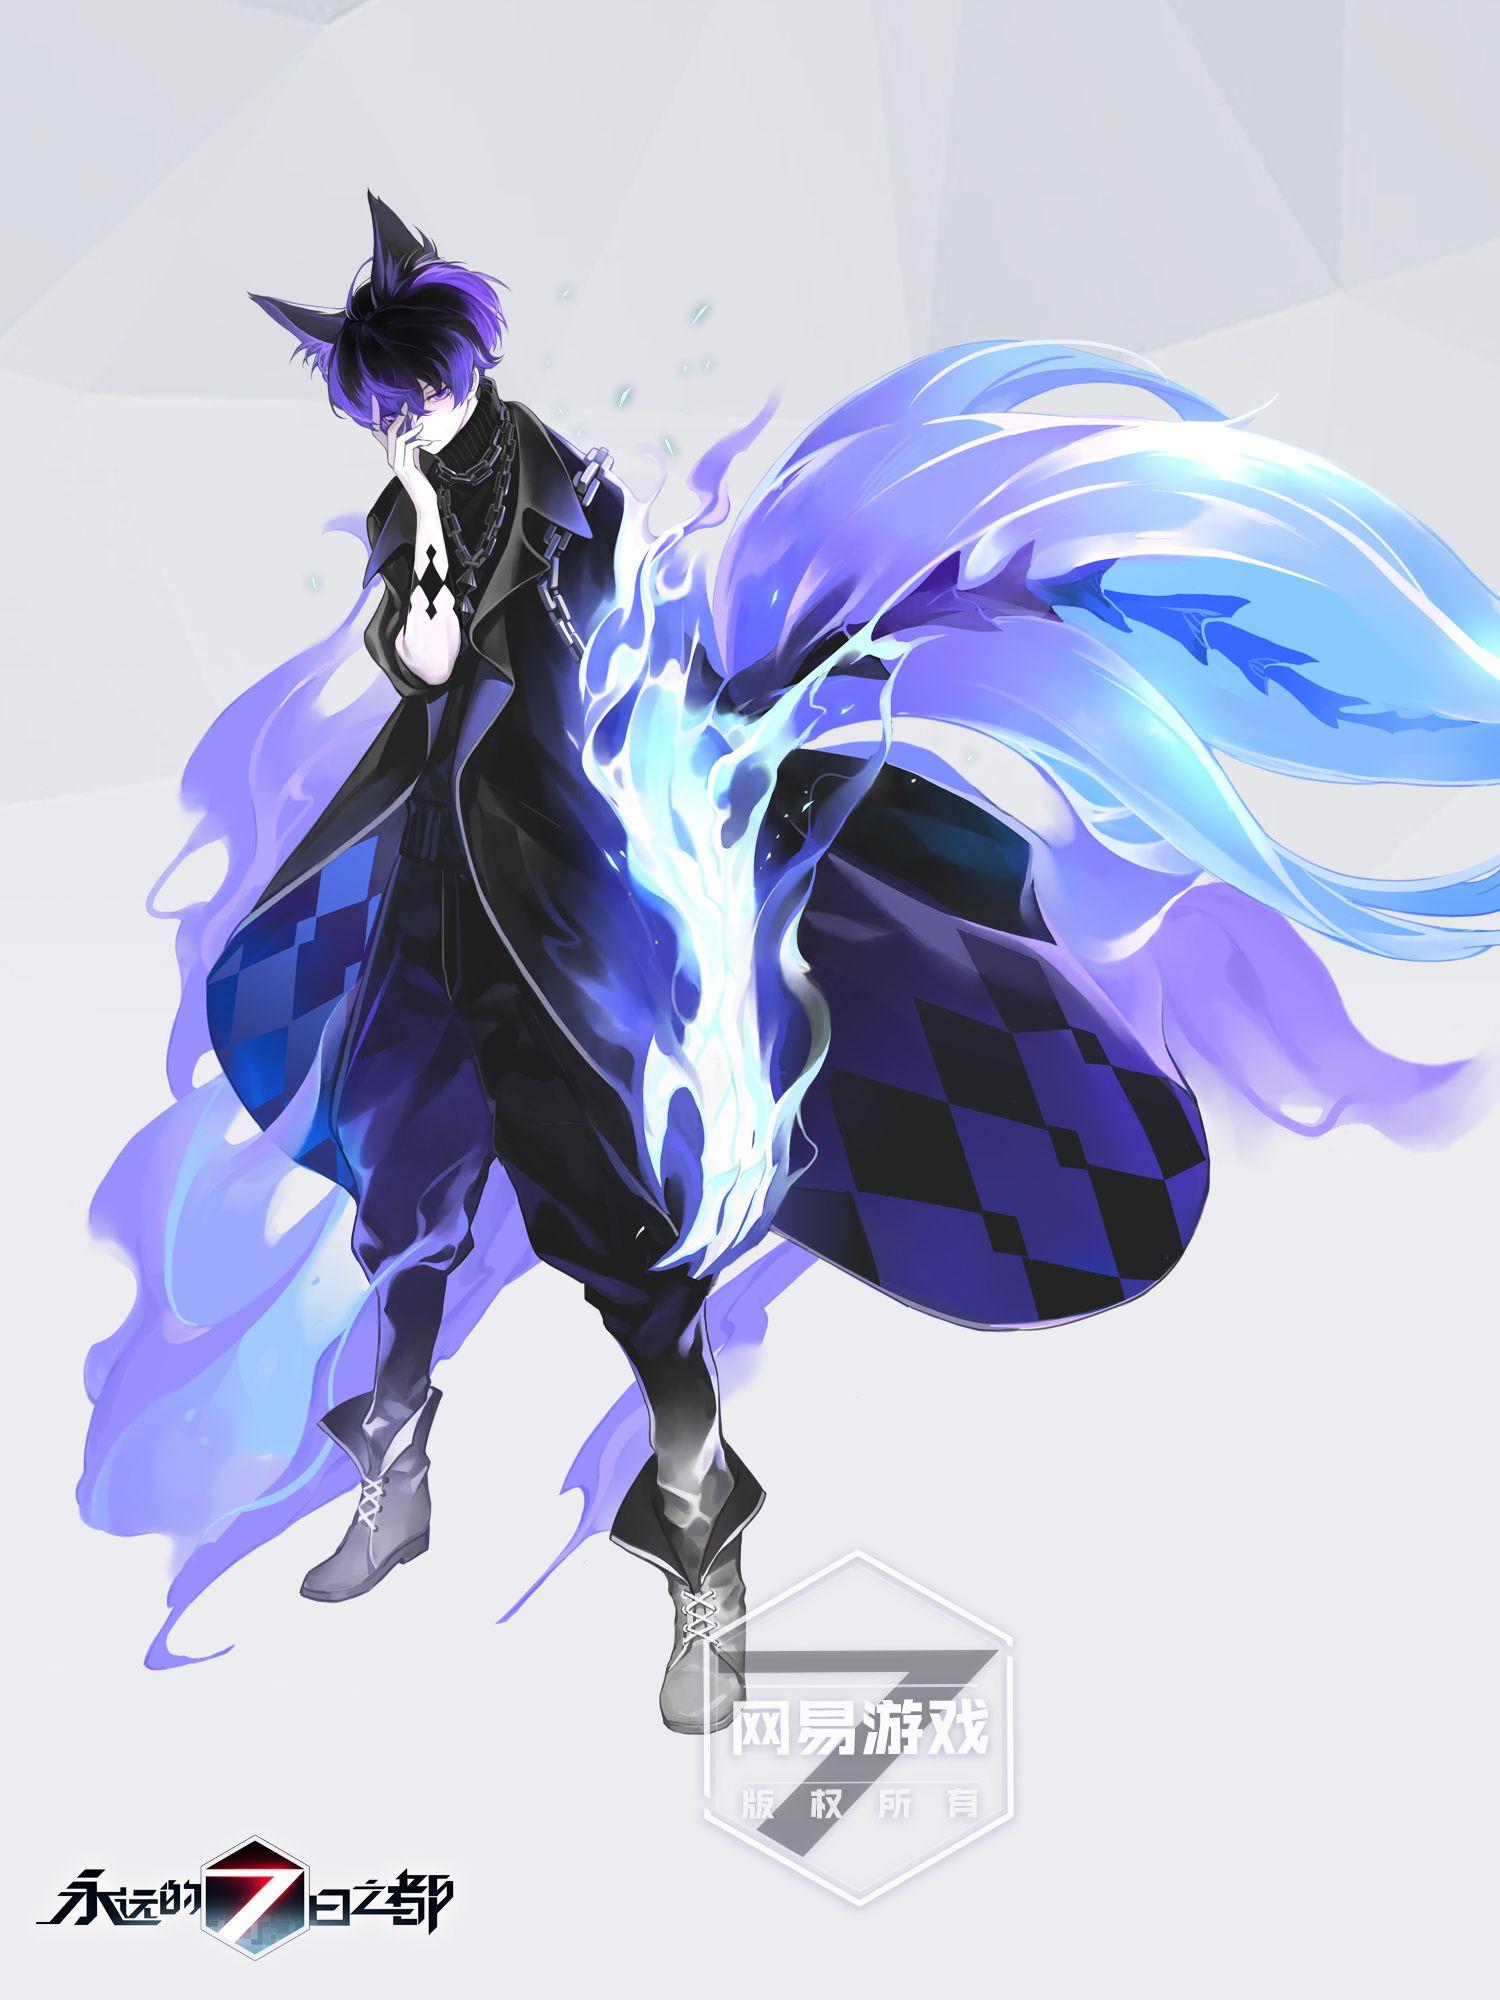 Pin By Shenui Lee On Seni Anime Character Design Concept Art Characters Fantasy Character Design